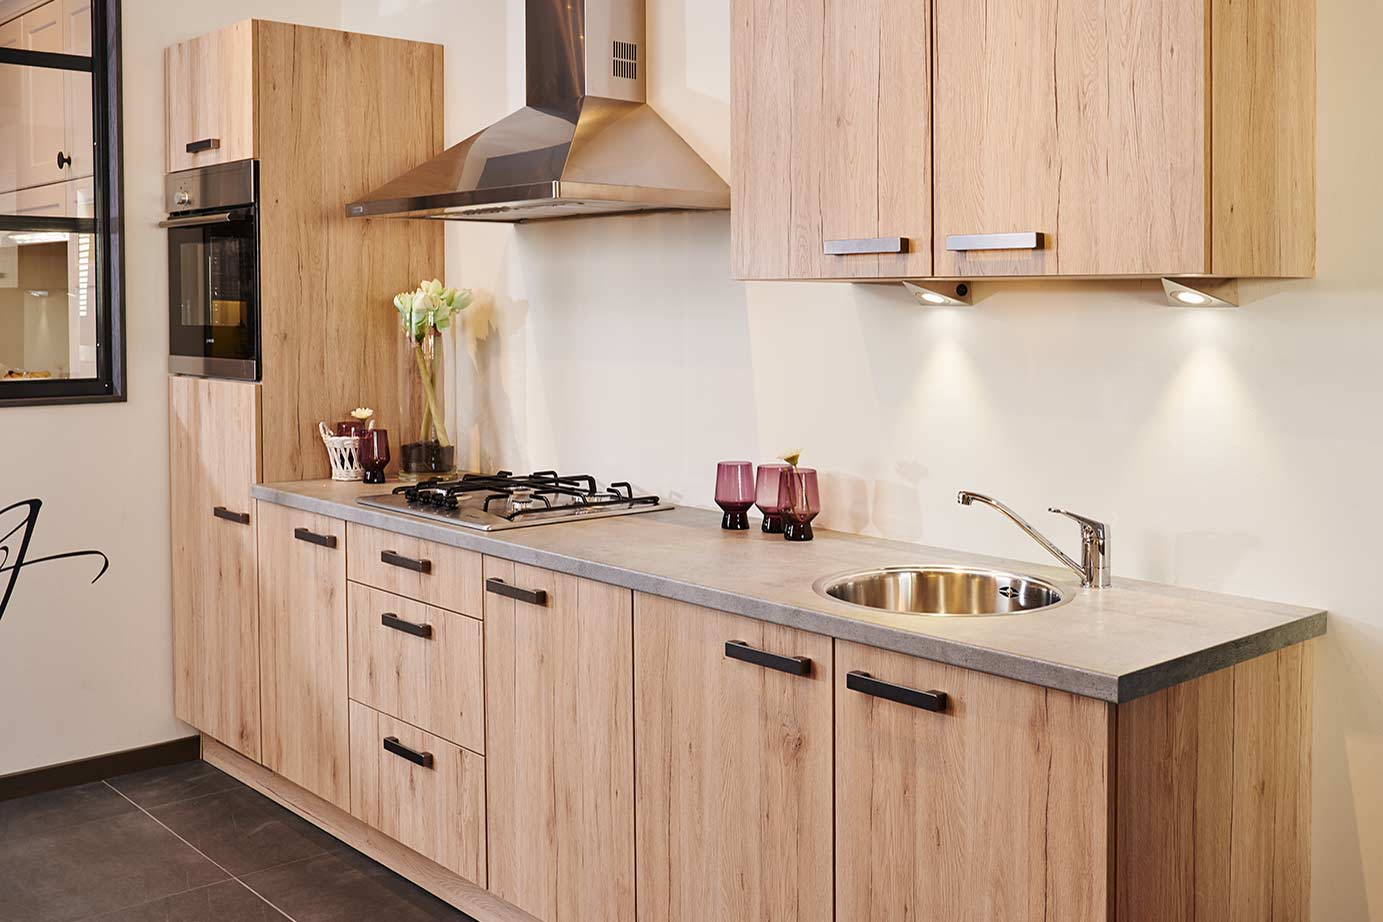 Witte keuken met houten werkblad moderne keukens de mooiste chalet design photos de la d co - D co keuken ...